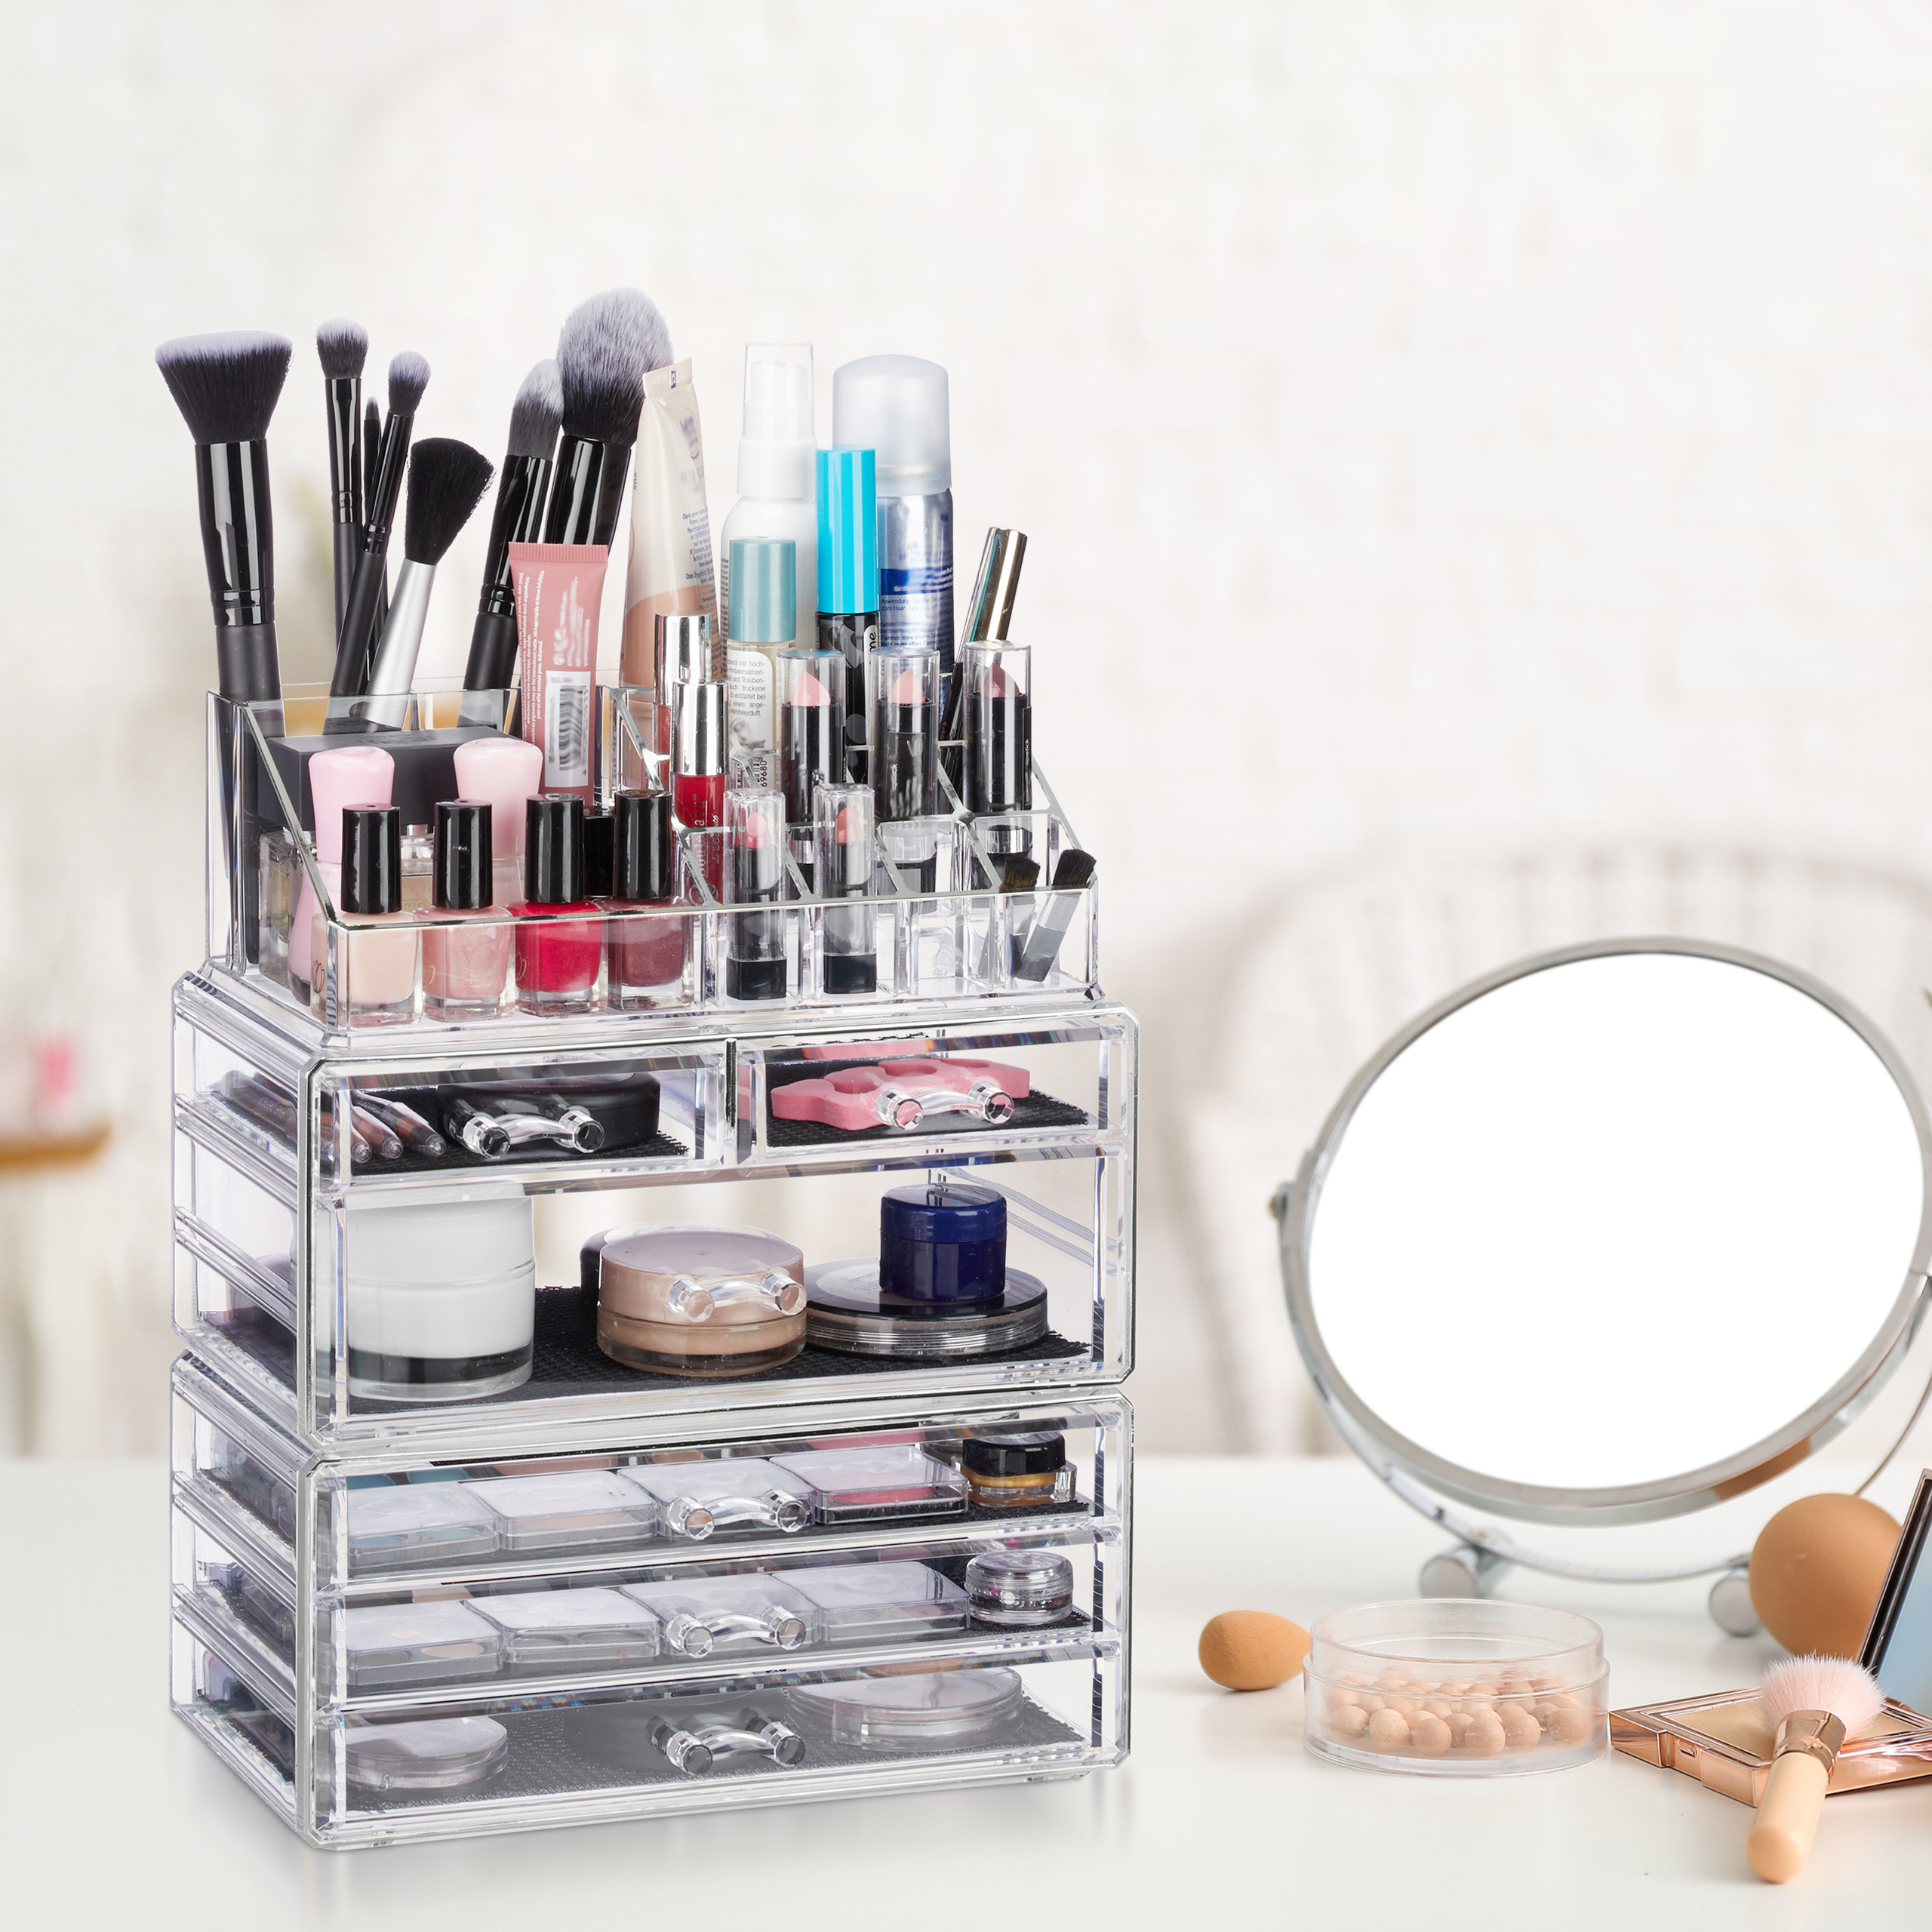 make-up-organizer-met-6-lades-acryl-cosmeticahouder-make-up-cosmetica-opslag miniatuur 3